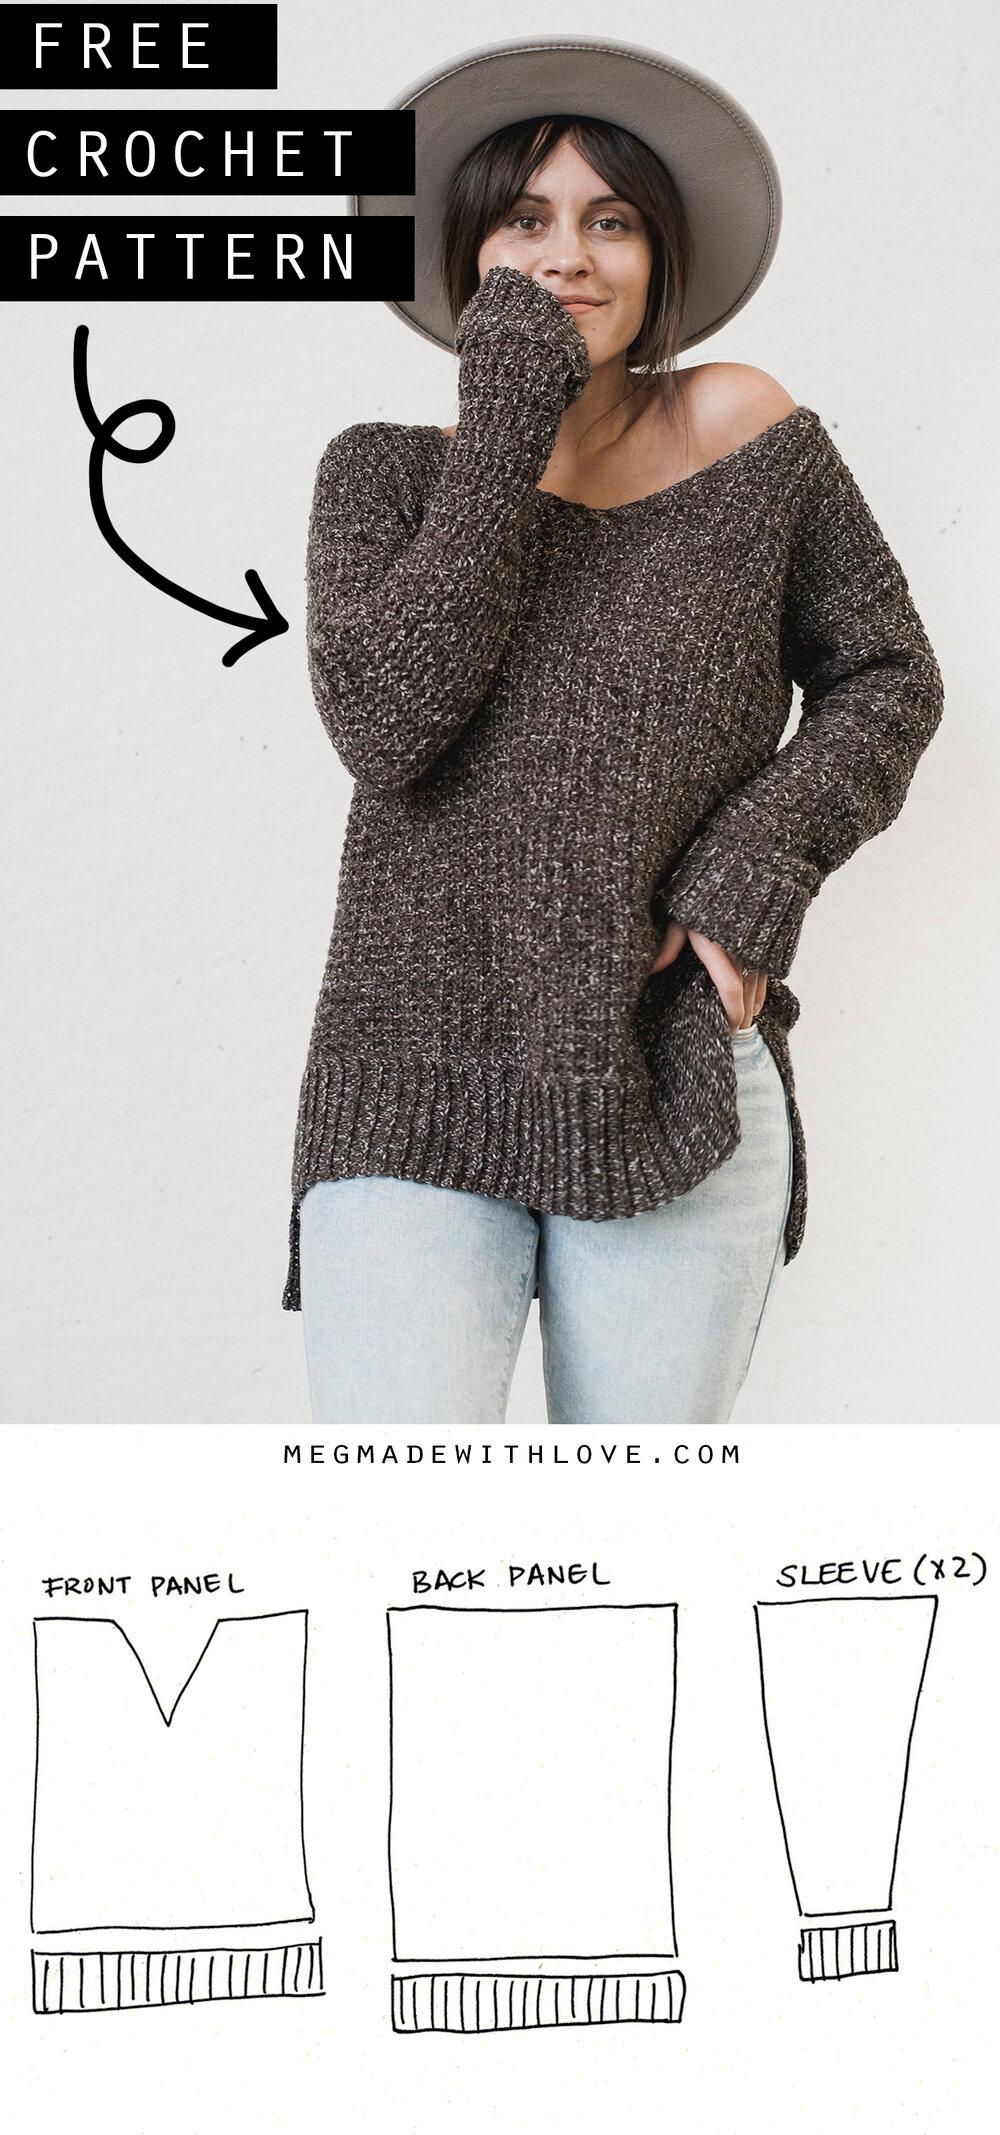 The Home Girl Sweater - Crochet Sweater Pattern 3